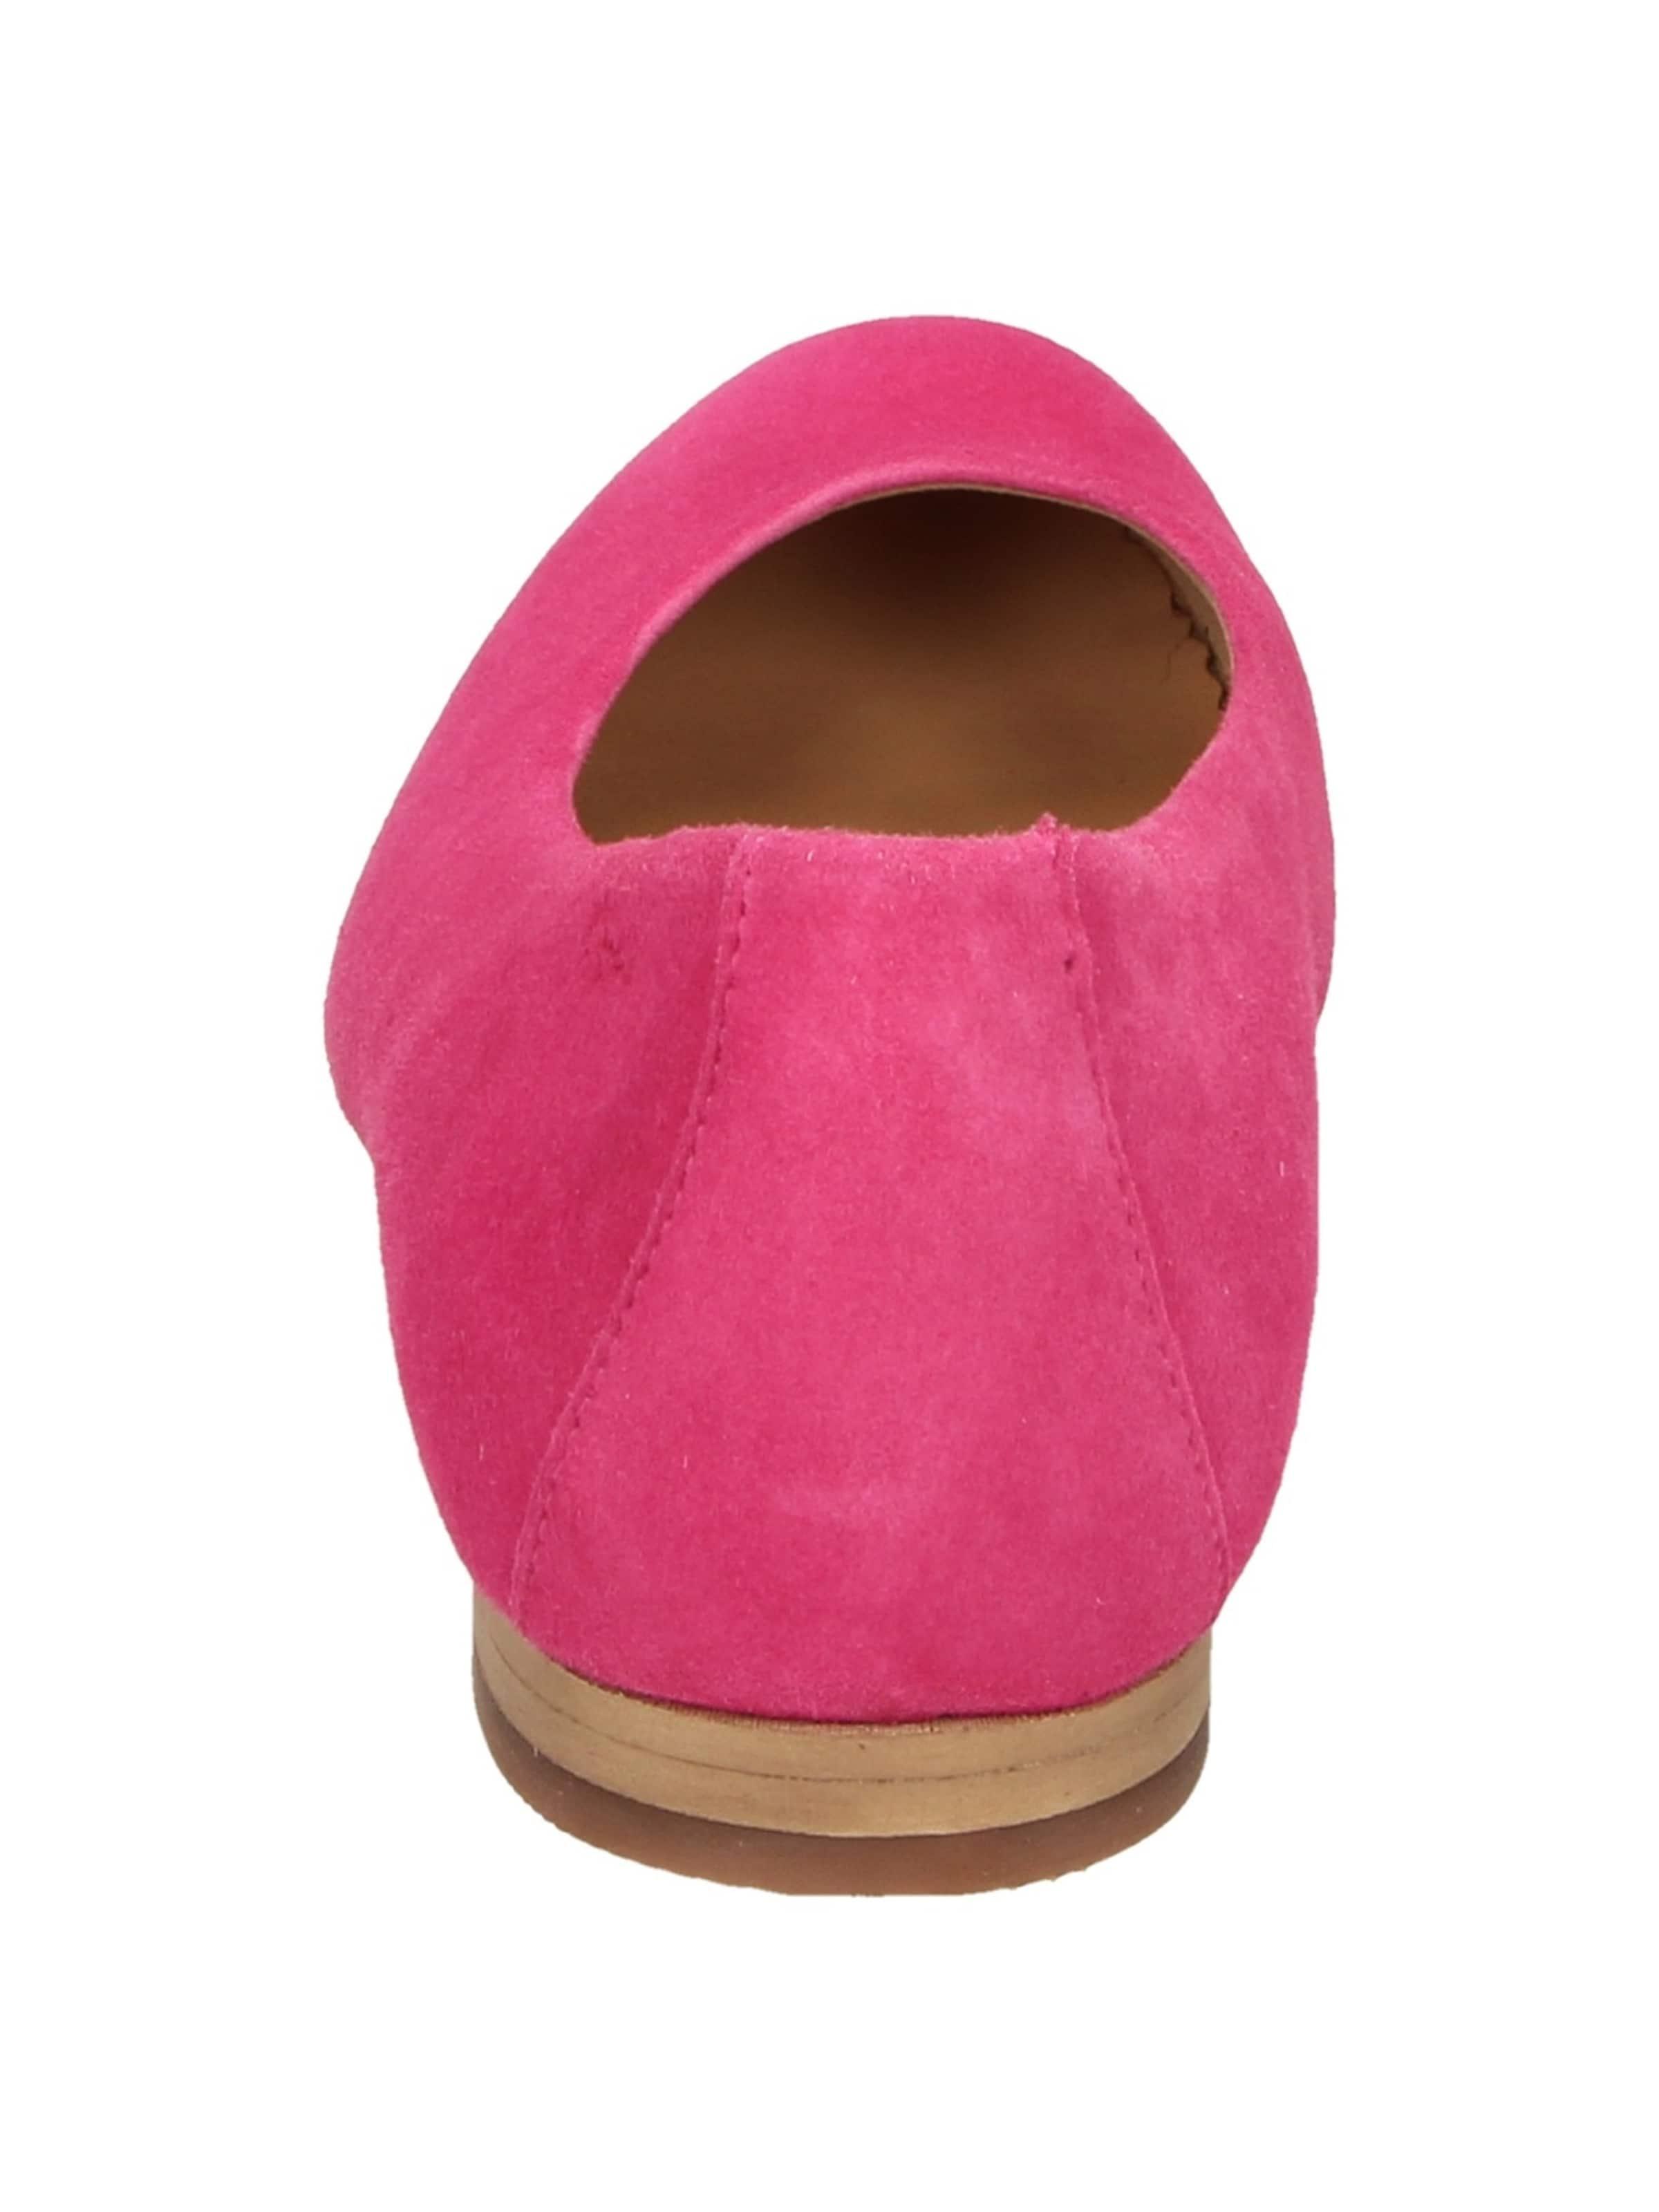 Pink Sioux Ballerina 'hermina' In Sioux Ov0m8nwN